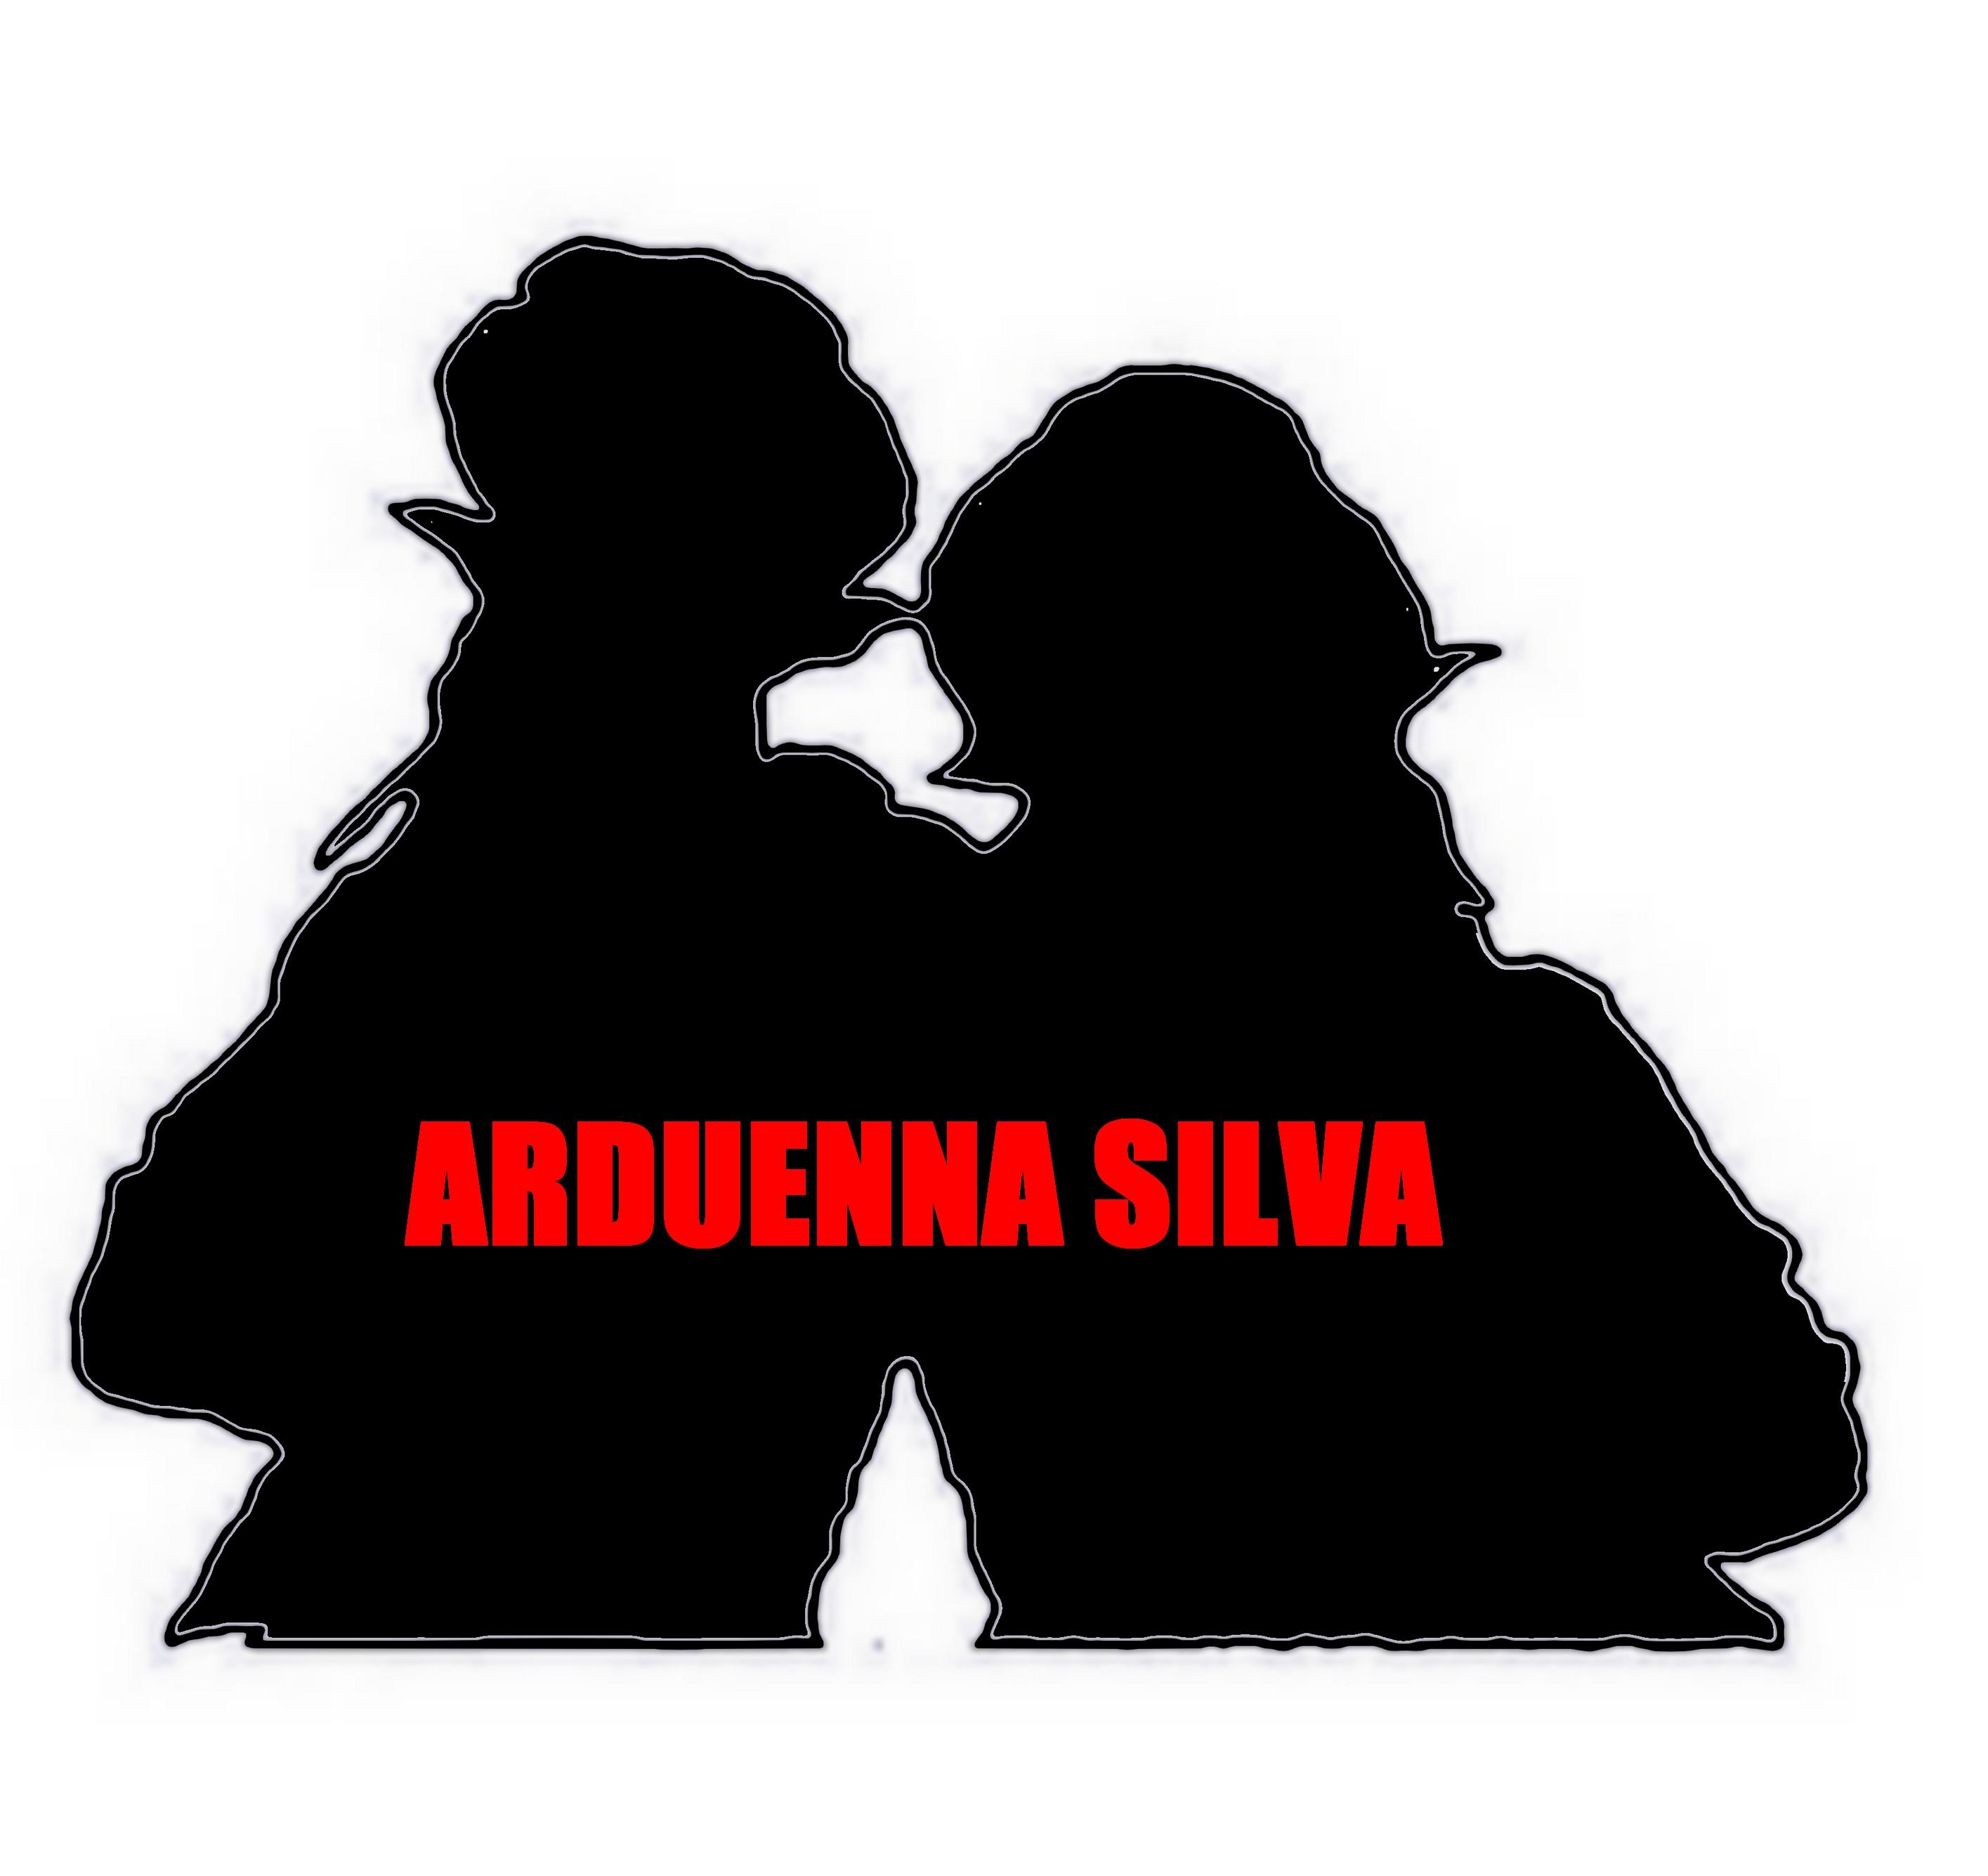 Arduenna Silva